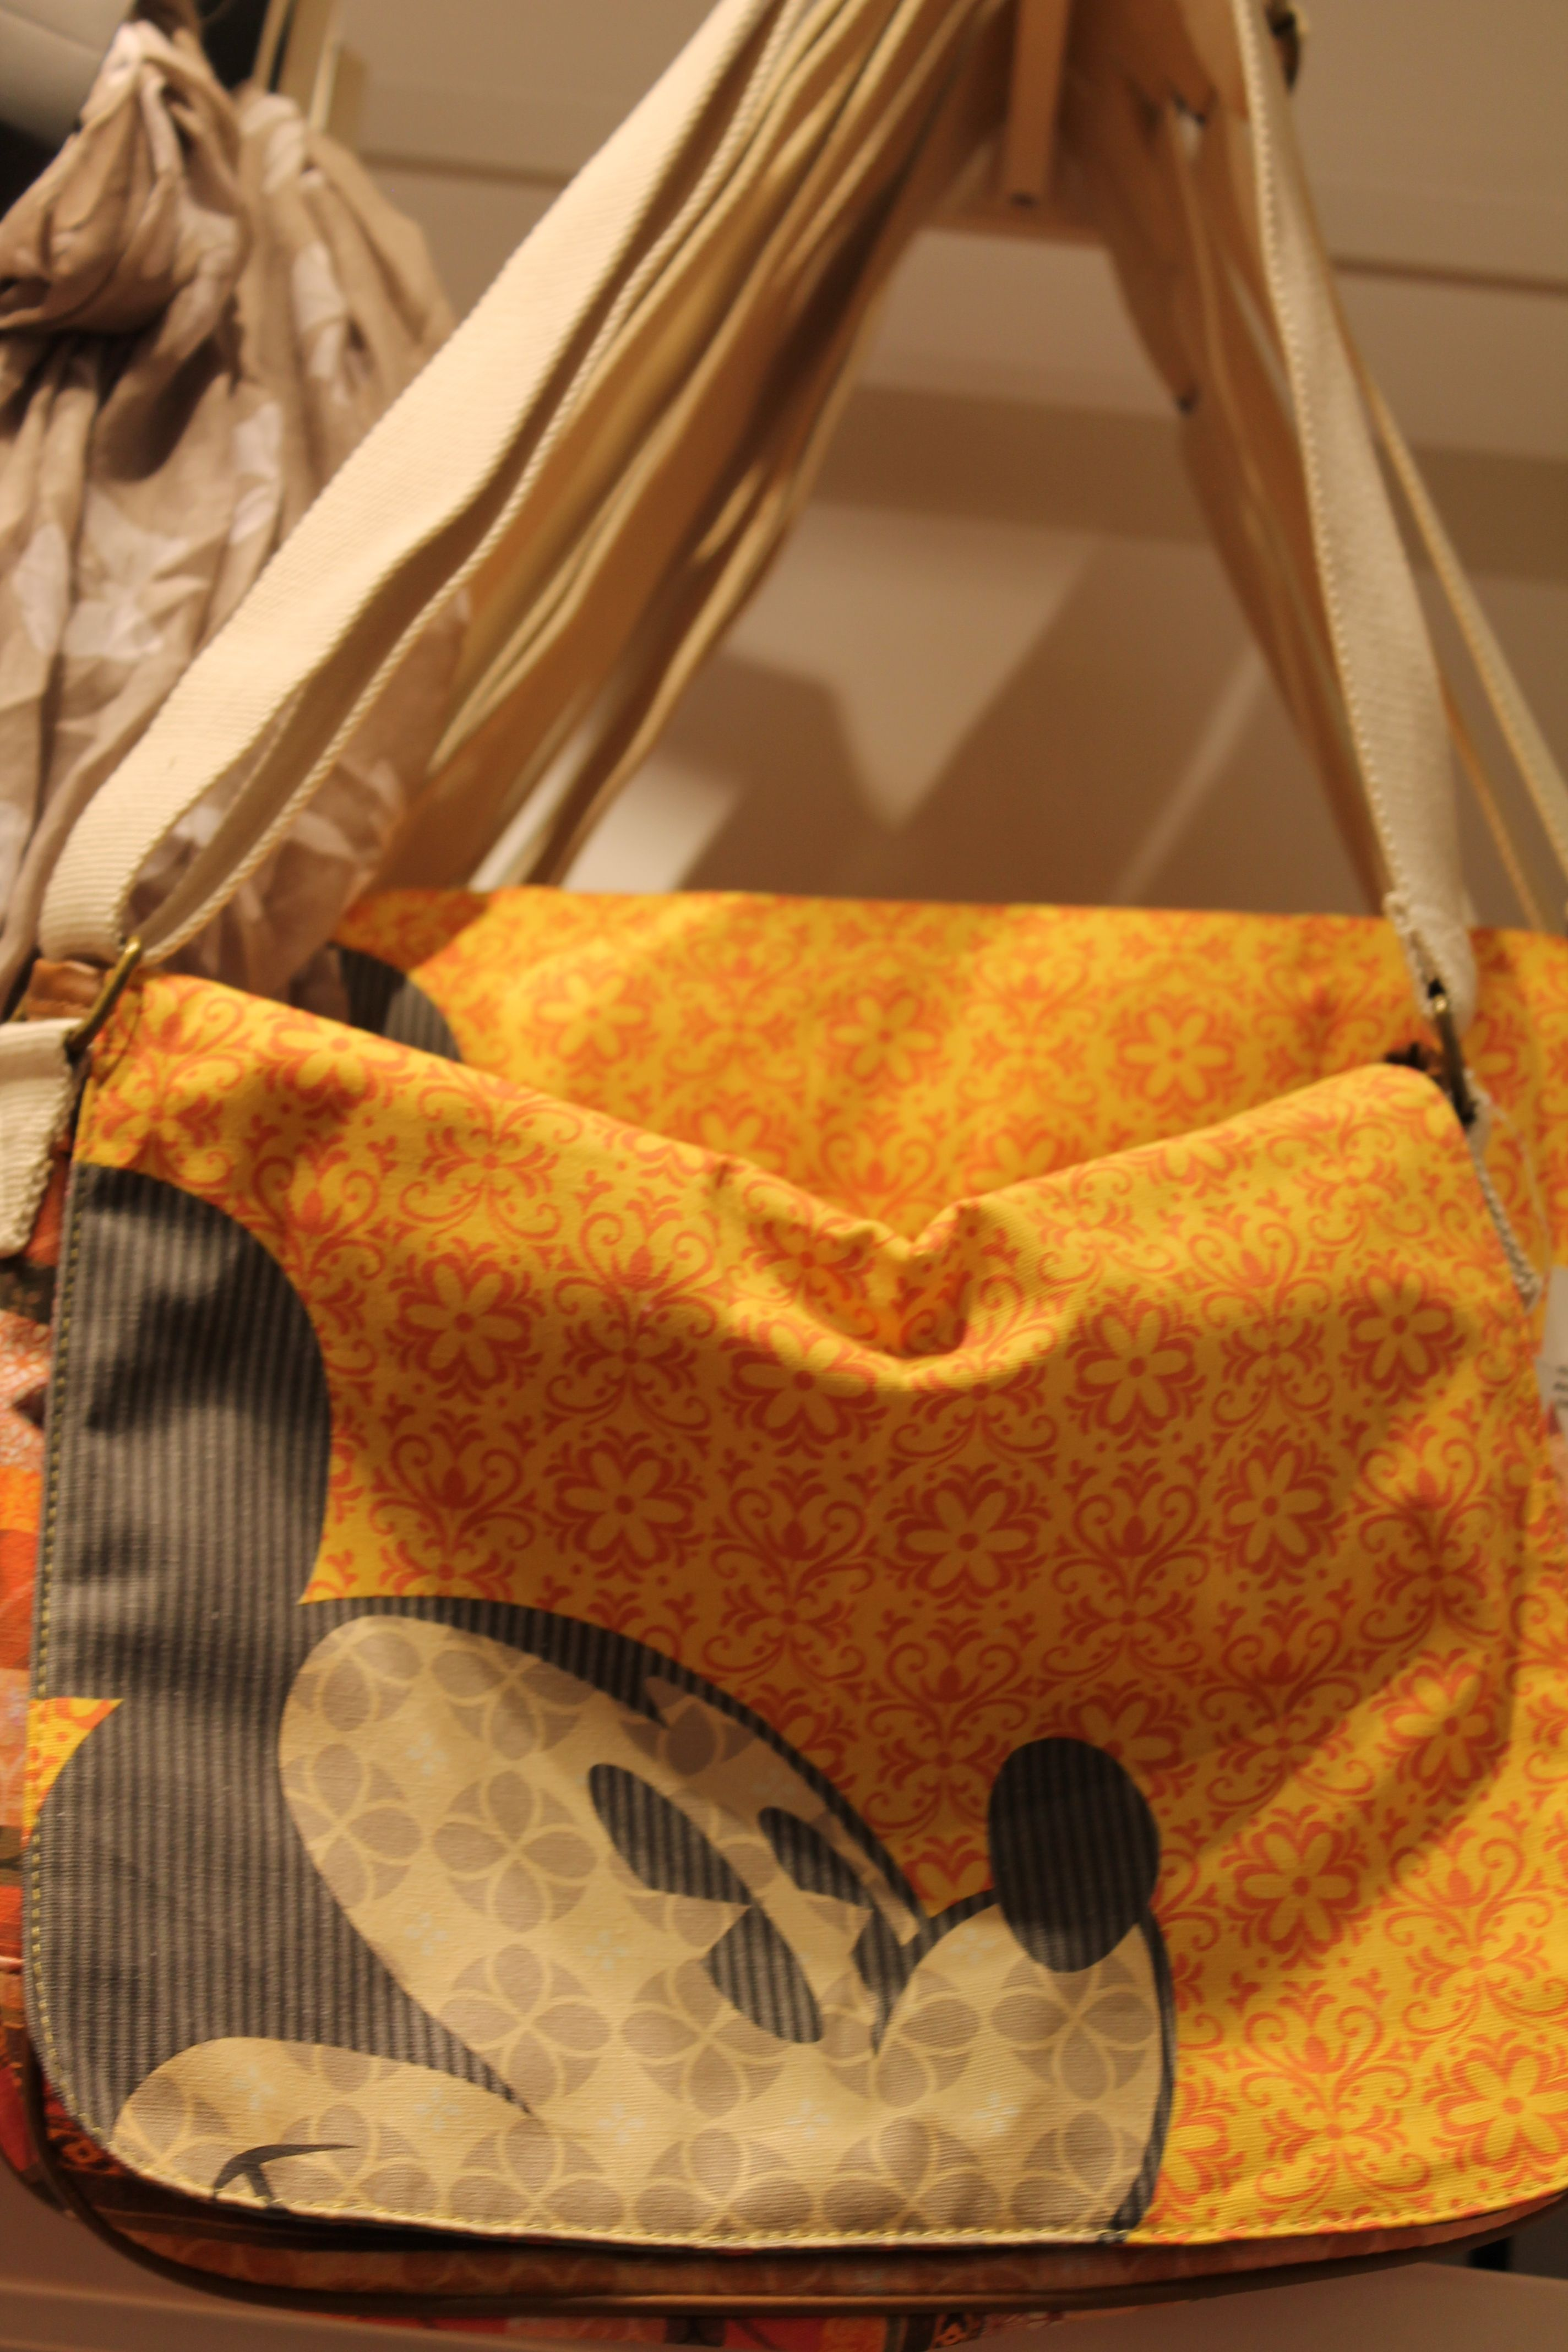 Walt Disney World s Mickey Mouse purse